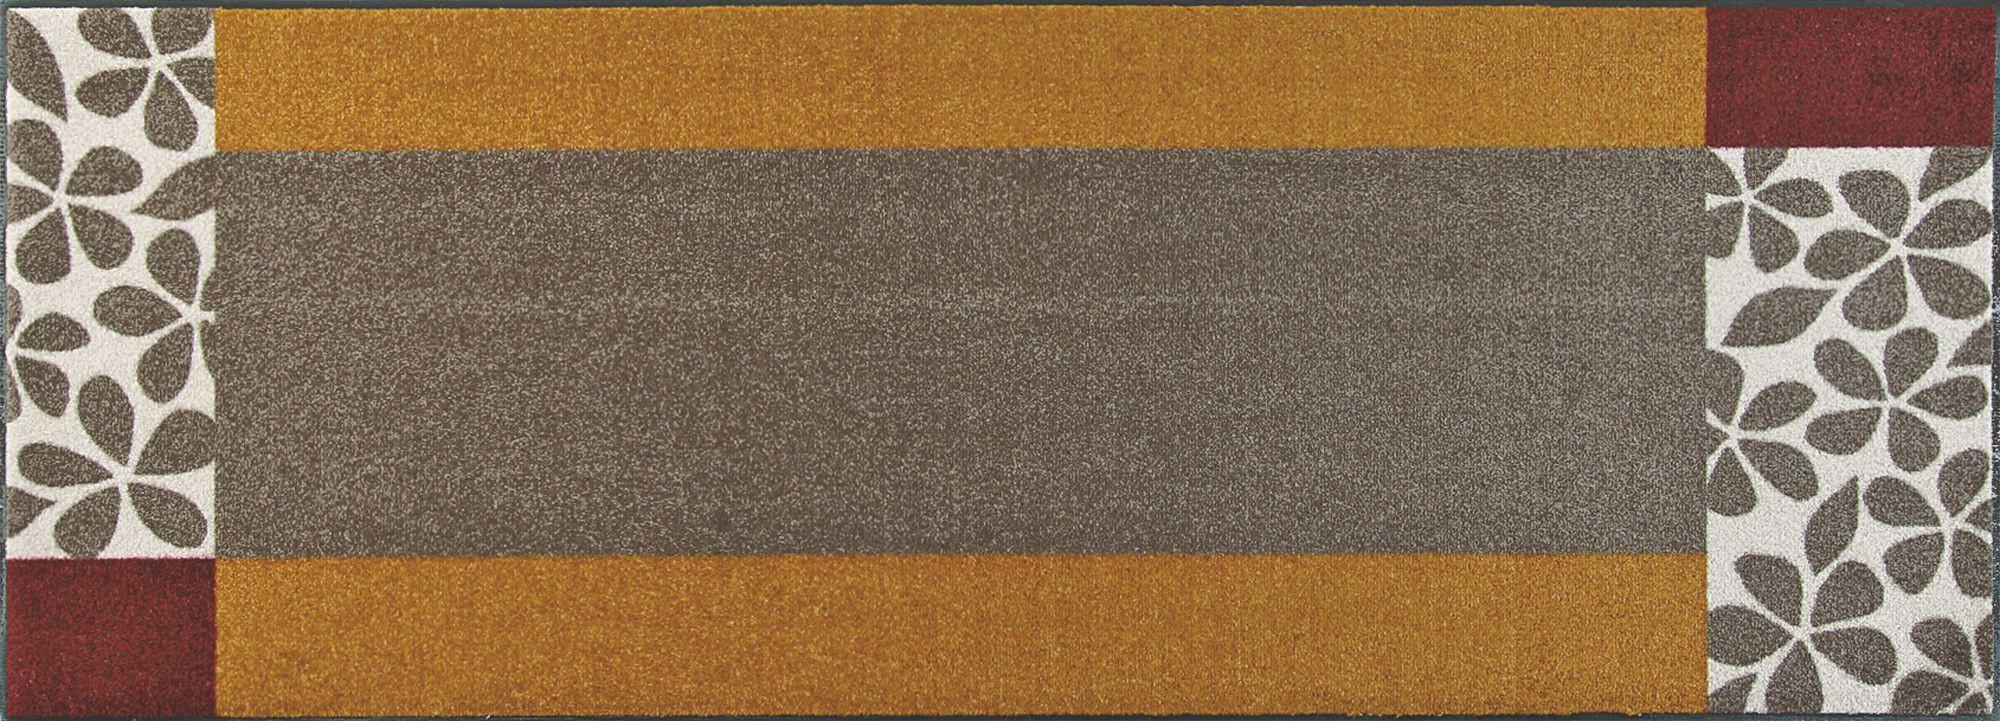 florita waschbare fu matte wash dry blumenmotiv. Black Bedroom Furniture Sets. Home Design Ideas